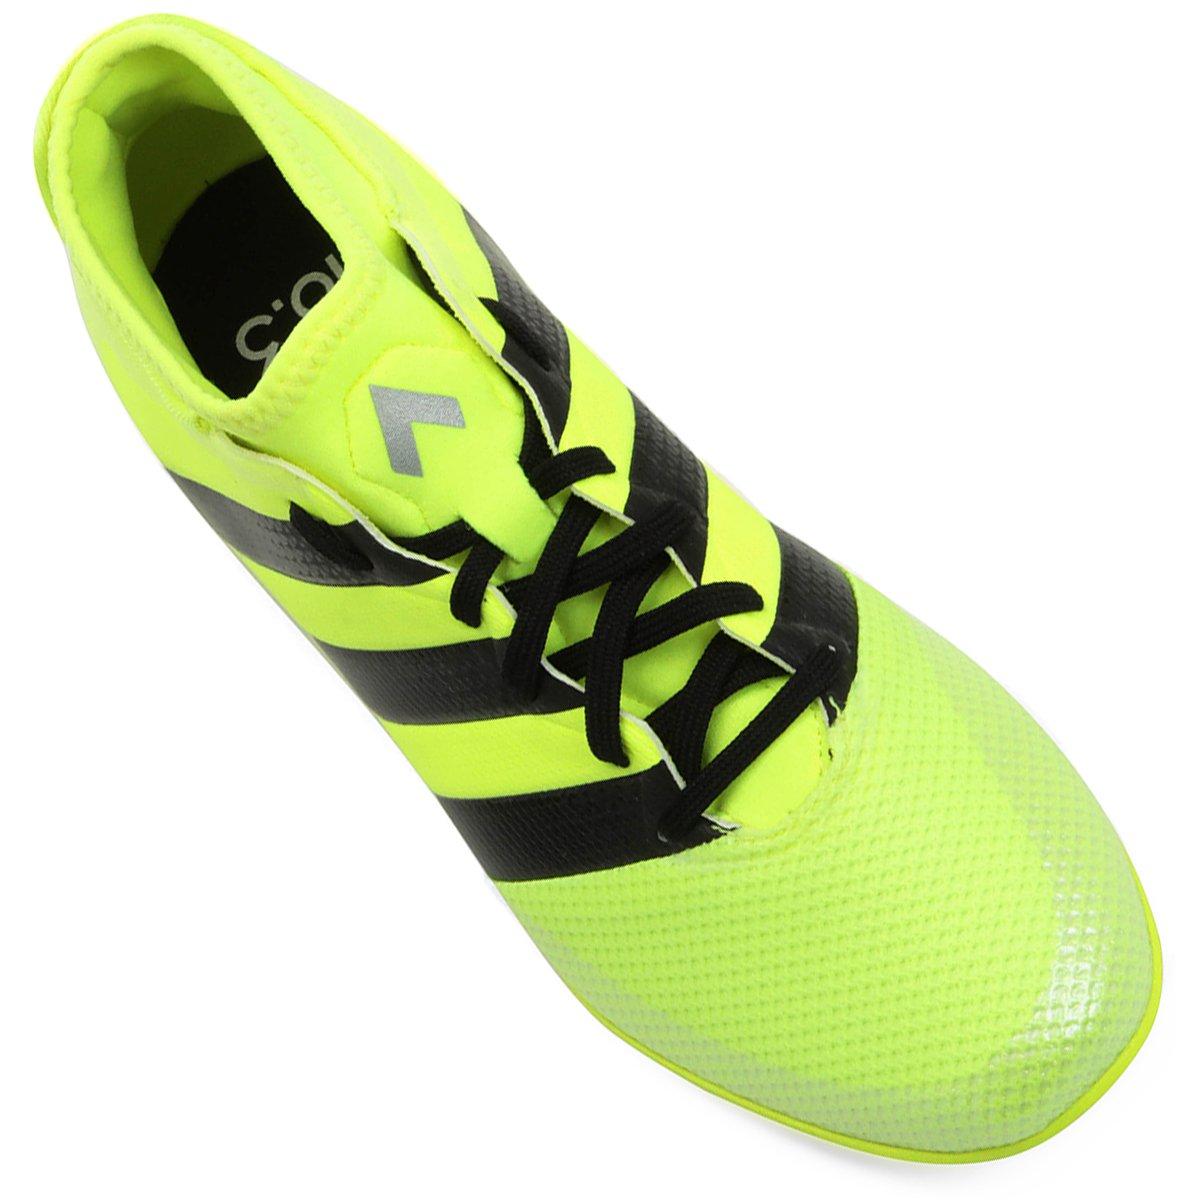 Chuteira Futsal Adidas Ace 16.3 Primemesh IN Masculina - Verde Limão ... c2eed282817d4